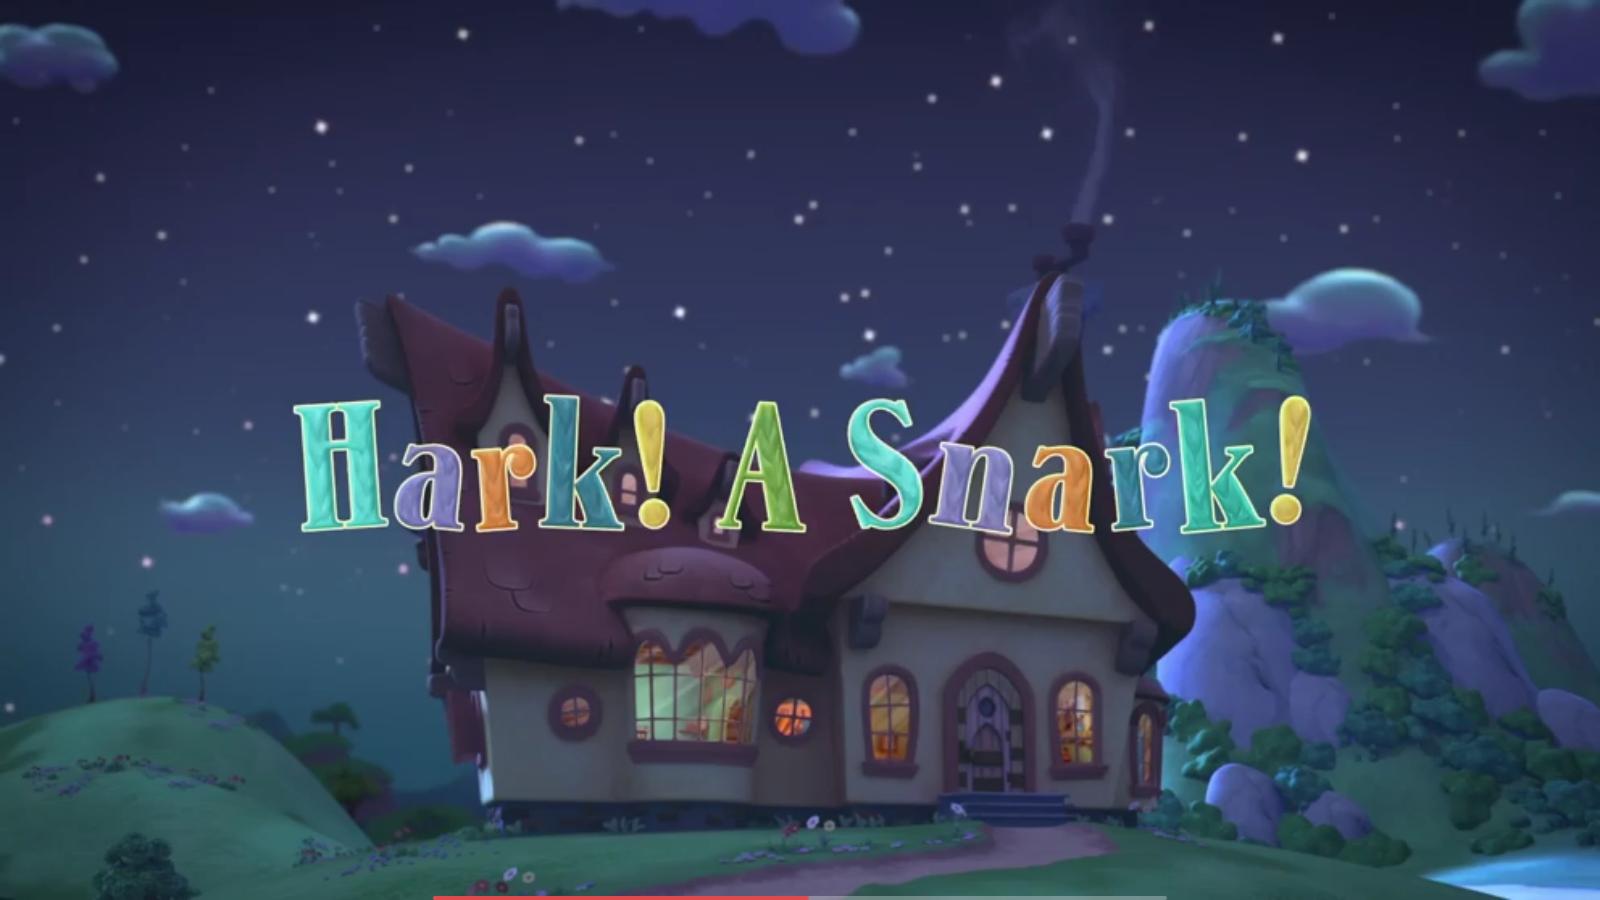 Hark! A Snark!